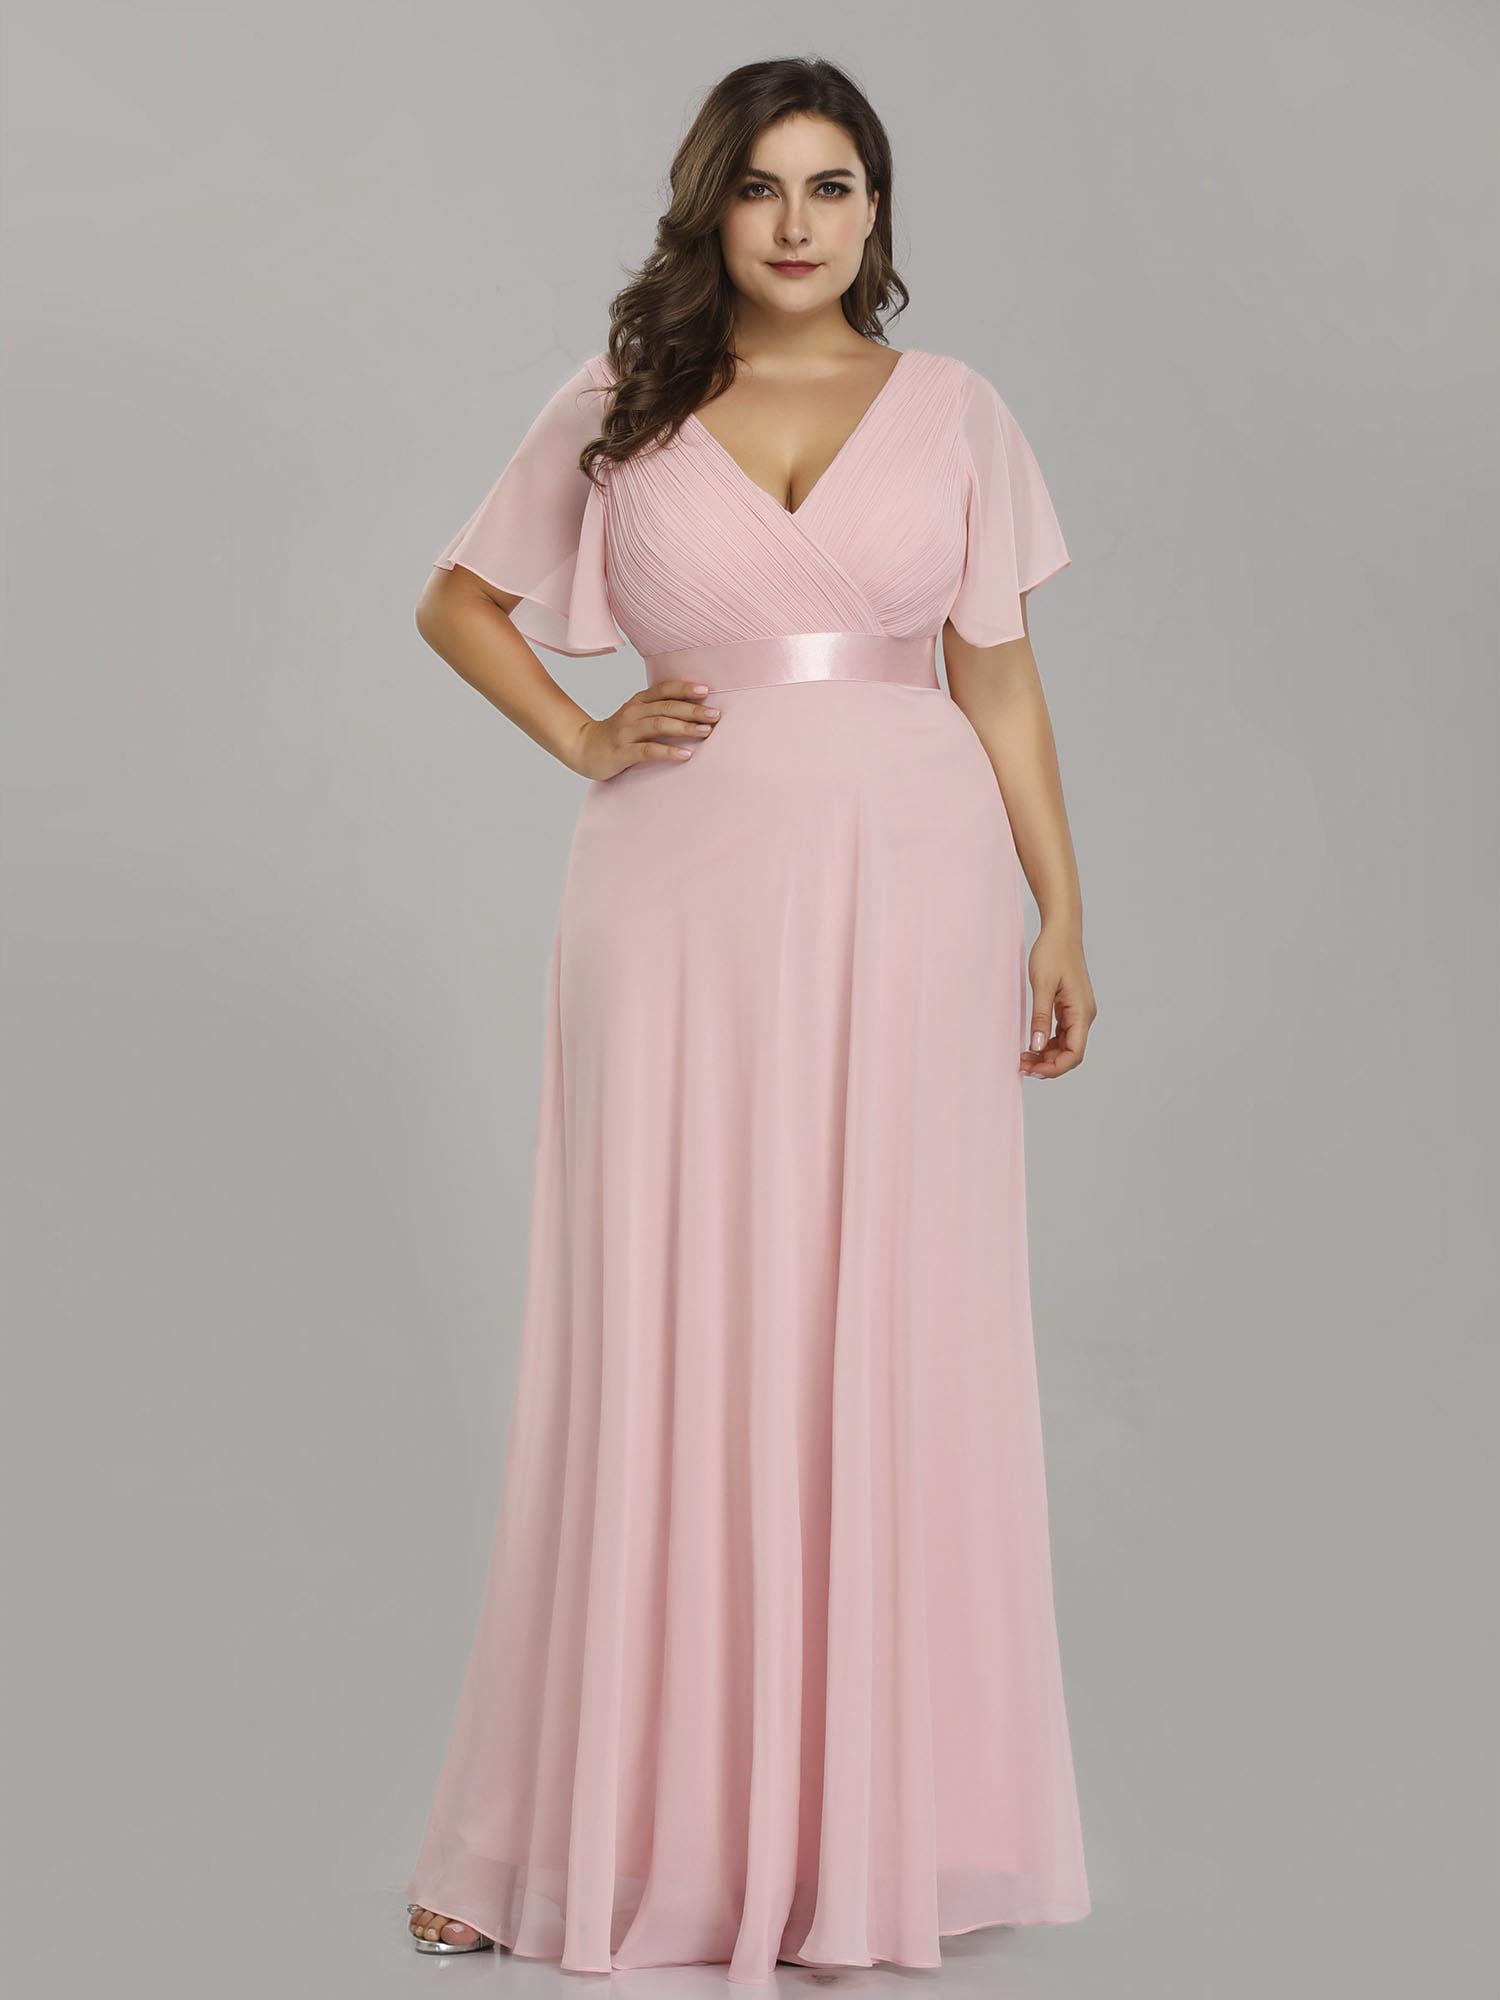 Ever-Pretty Womens Elegant Chiffon Short Sleeve Long Formal Evening Party Maxi Dresses for Women 98902 Burgundy US4